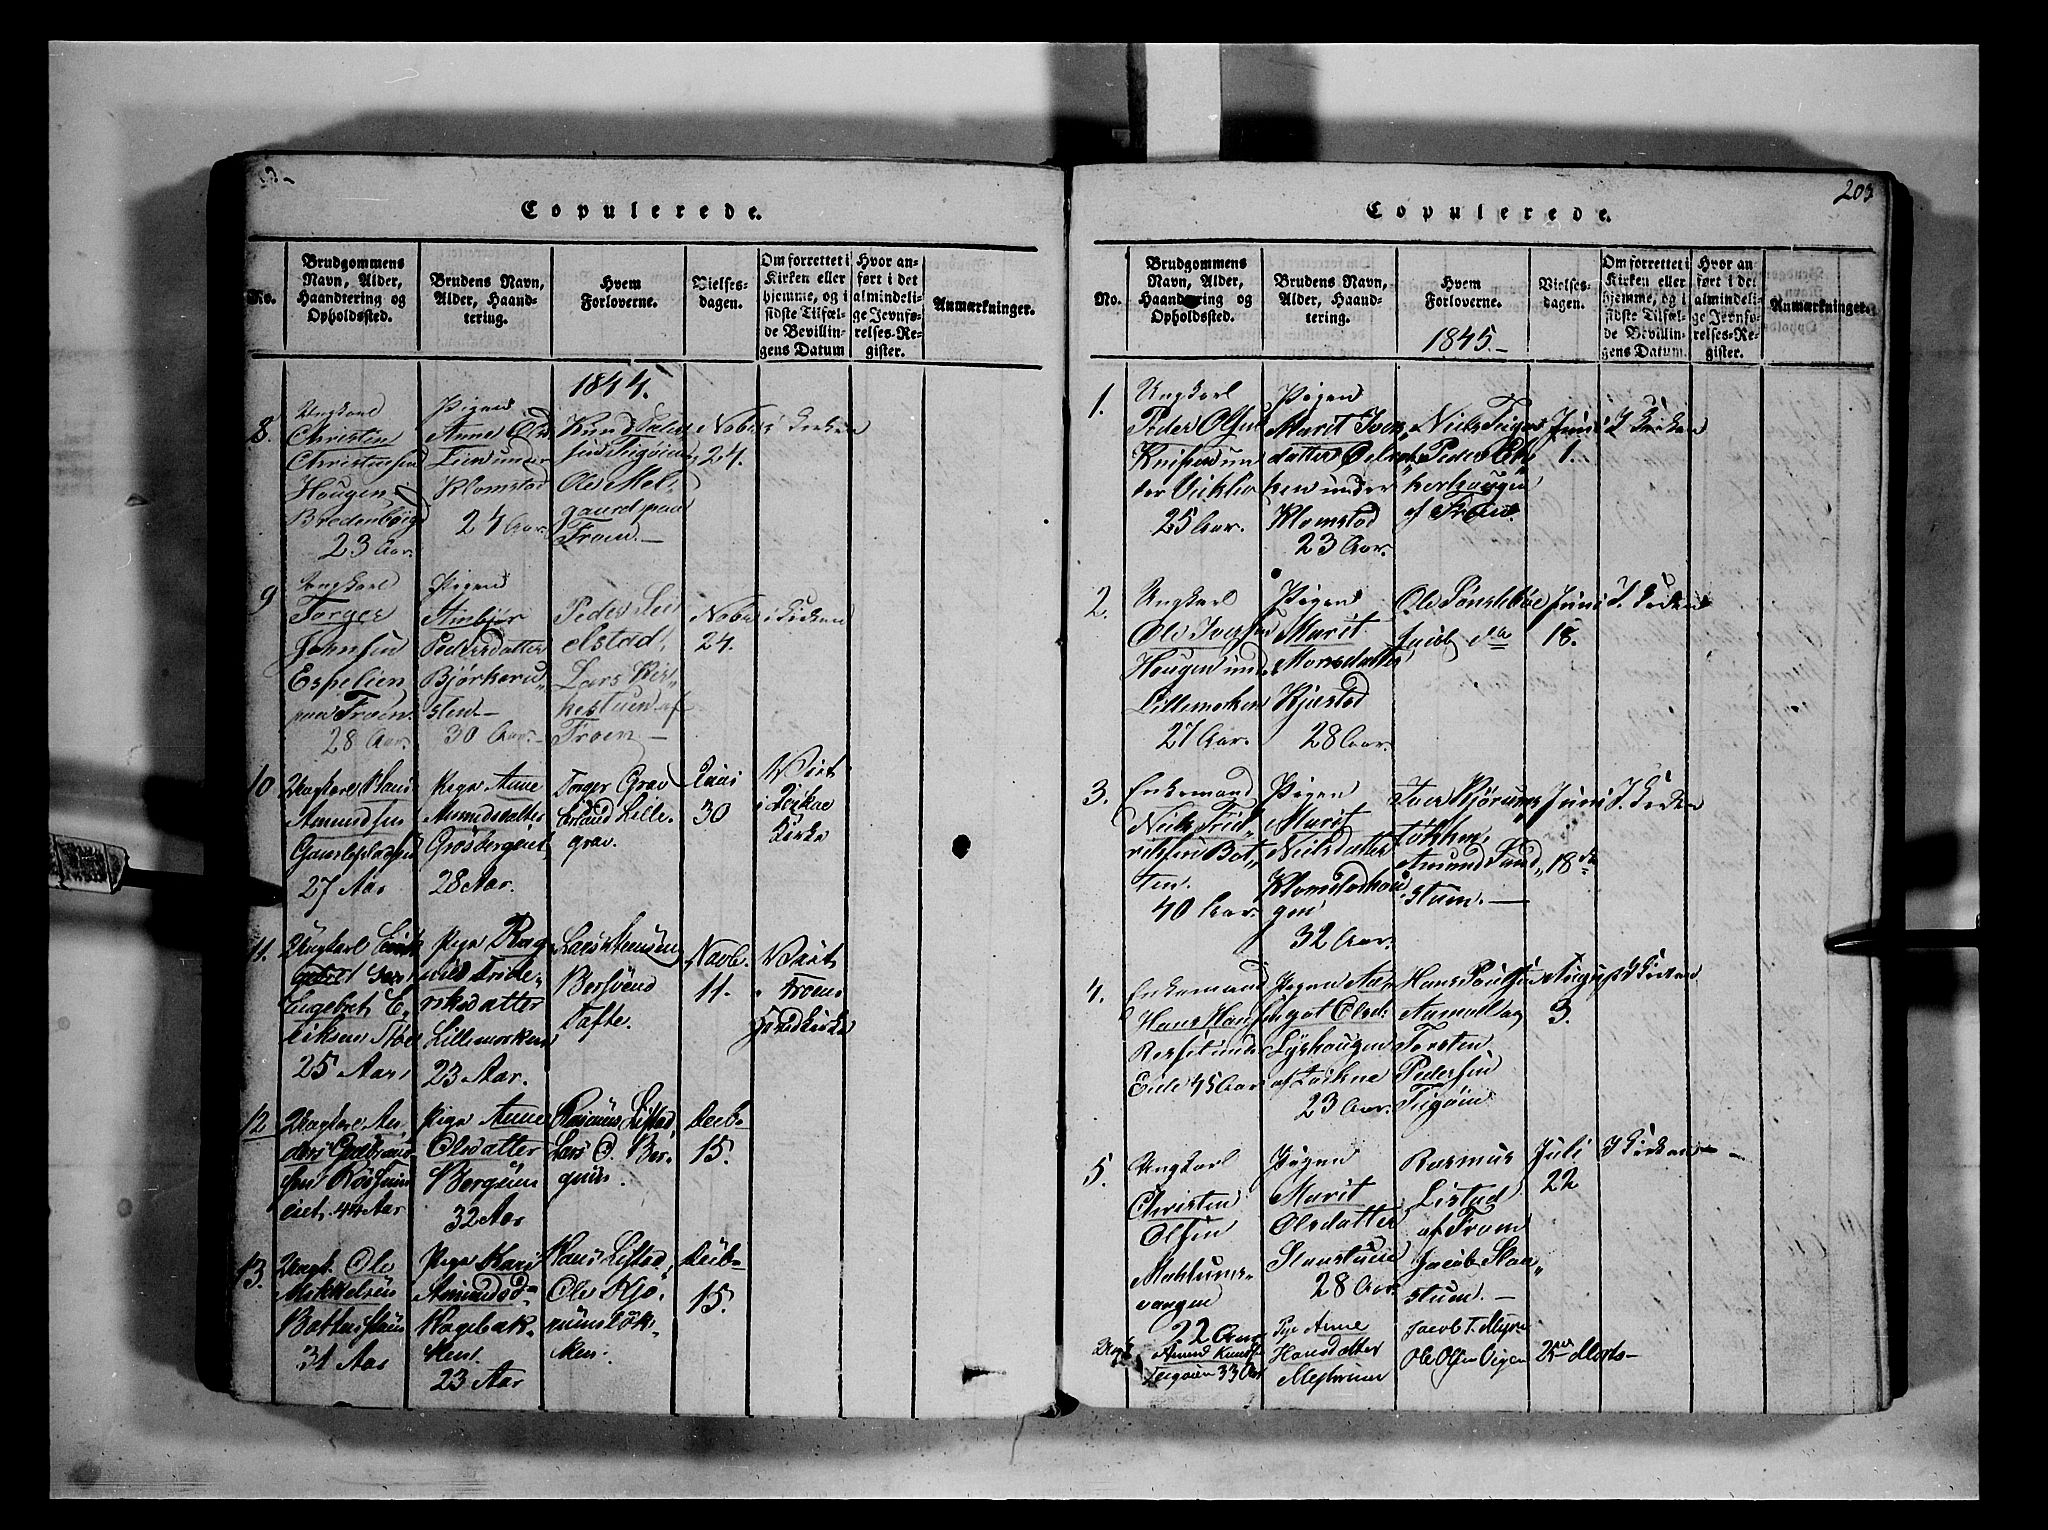 SAH, Fron prestekontor, H/Ha/Hab/L0002: Klokkerbok nr. 2, 1816-1850, s. 203